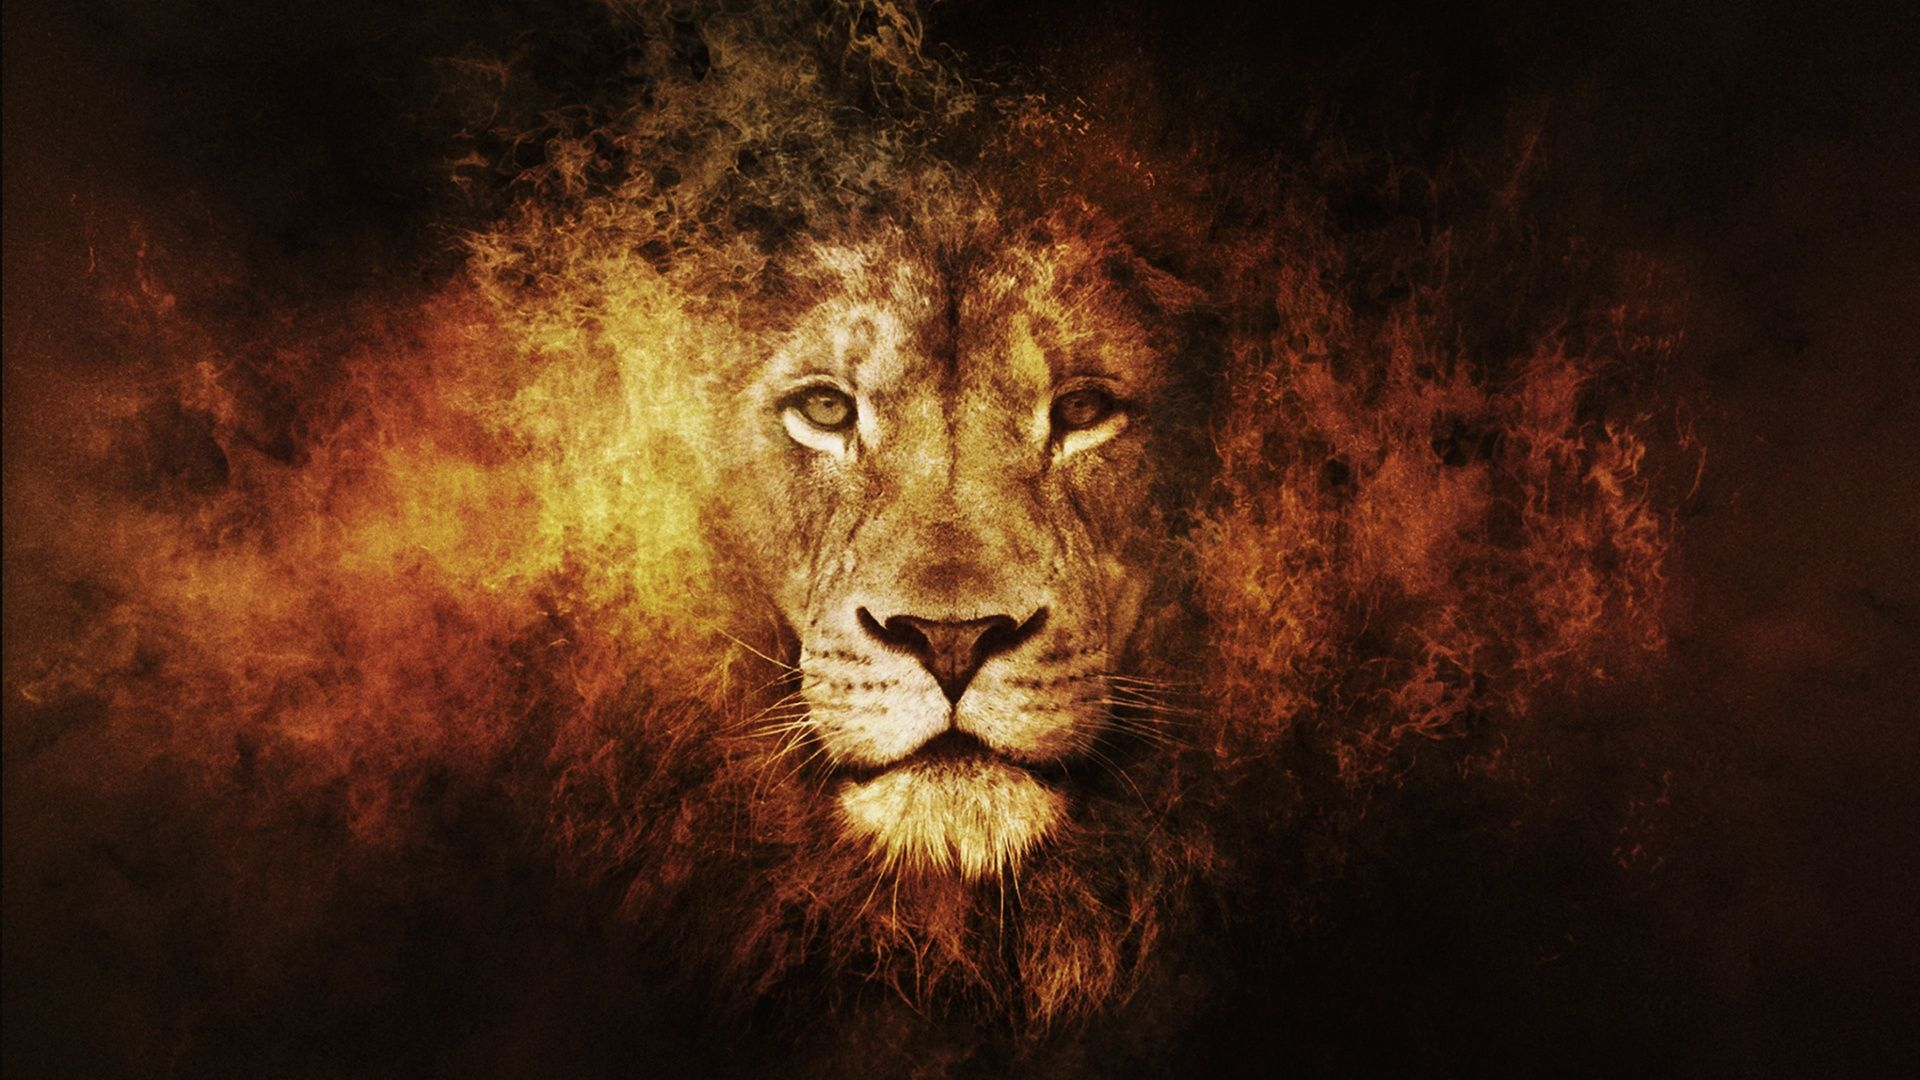 Desktop Lion Hd Wallpapers 1080p In 2020 Lion Artwork Lion Hd Wallpaper Lion Wallpaper